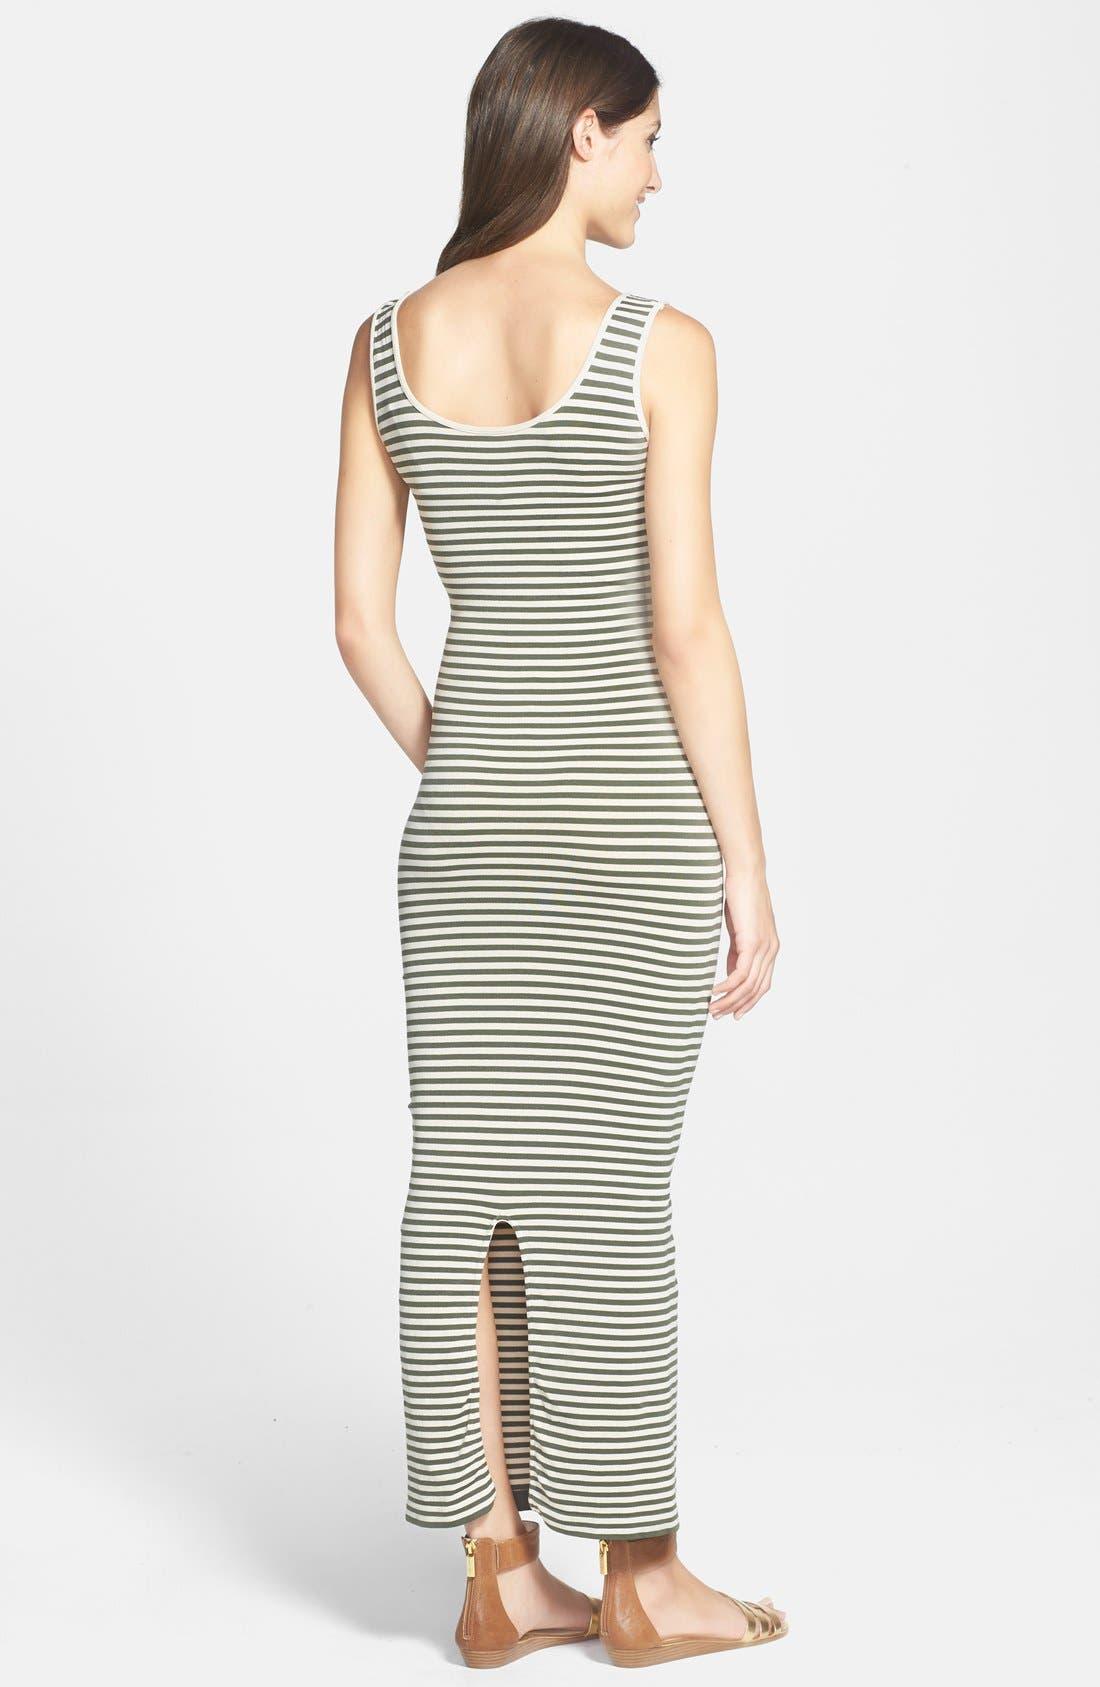 Micro Stripe Maternity Dress,                             Alternate thumbnail 7, color,                             300